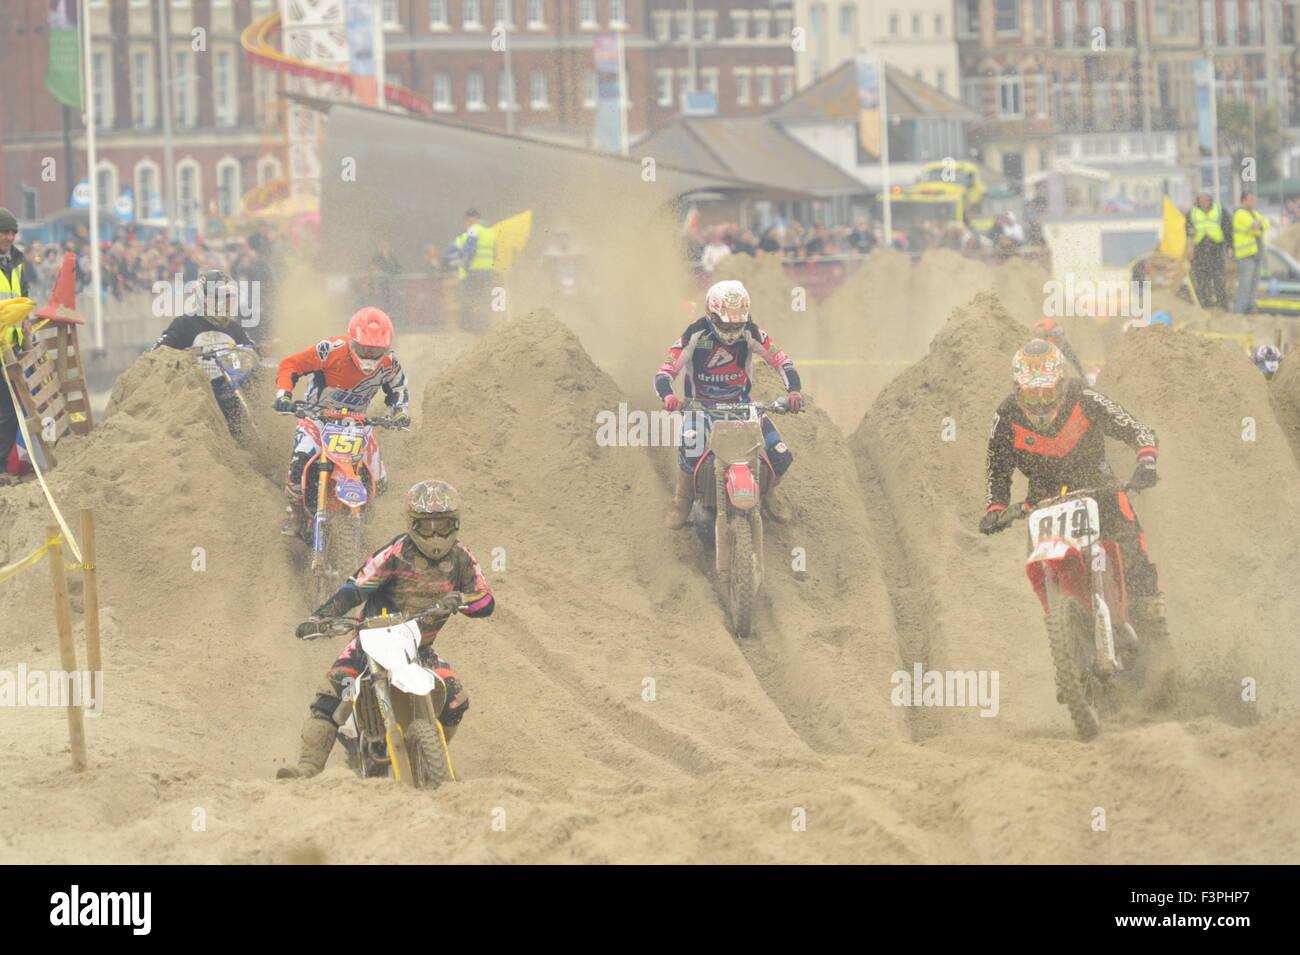 Weymouth, Dorset, UK - 11th October 2015. Annual Lion's Beach motocross weekend on Weymouth Beach.  Weymouth - Stock Image